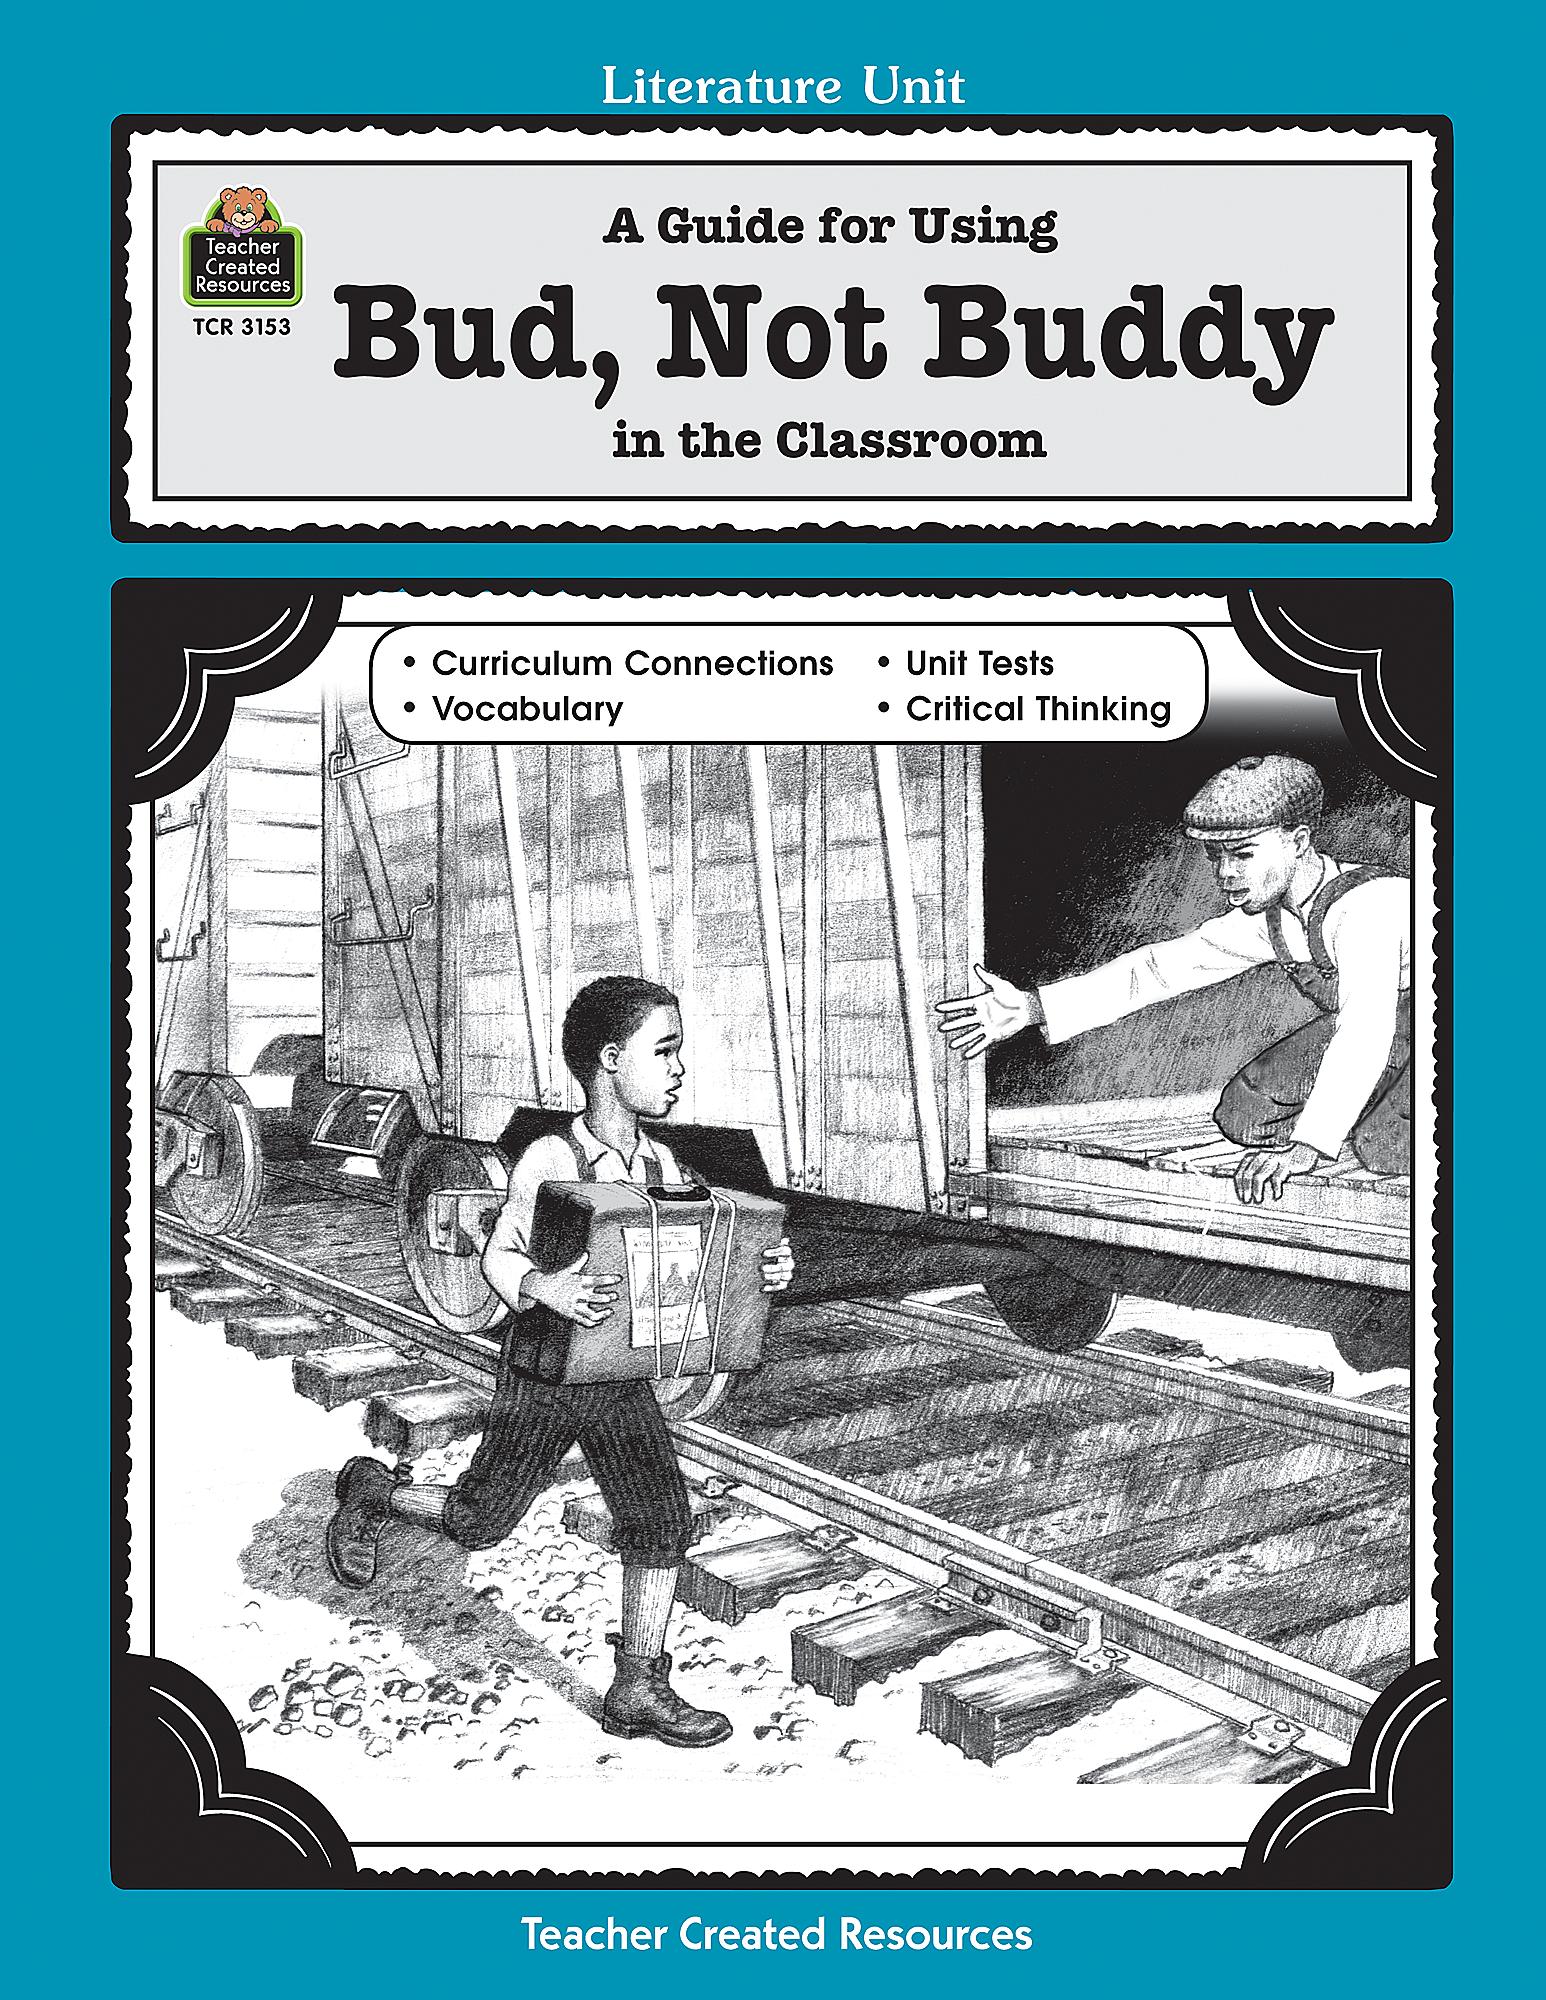 Bud not buddy summary and analysis